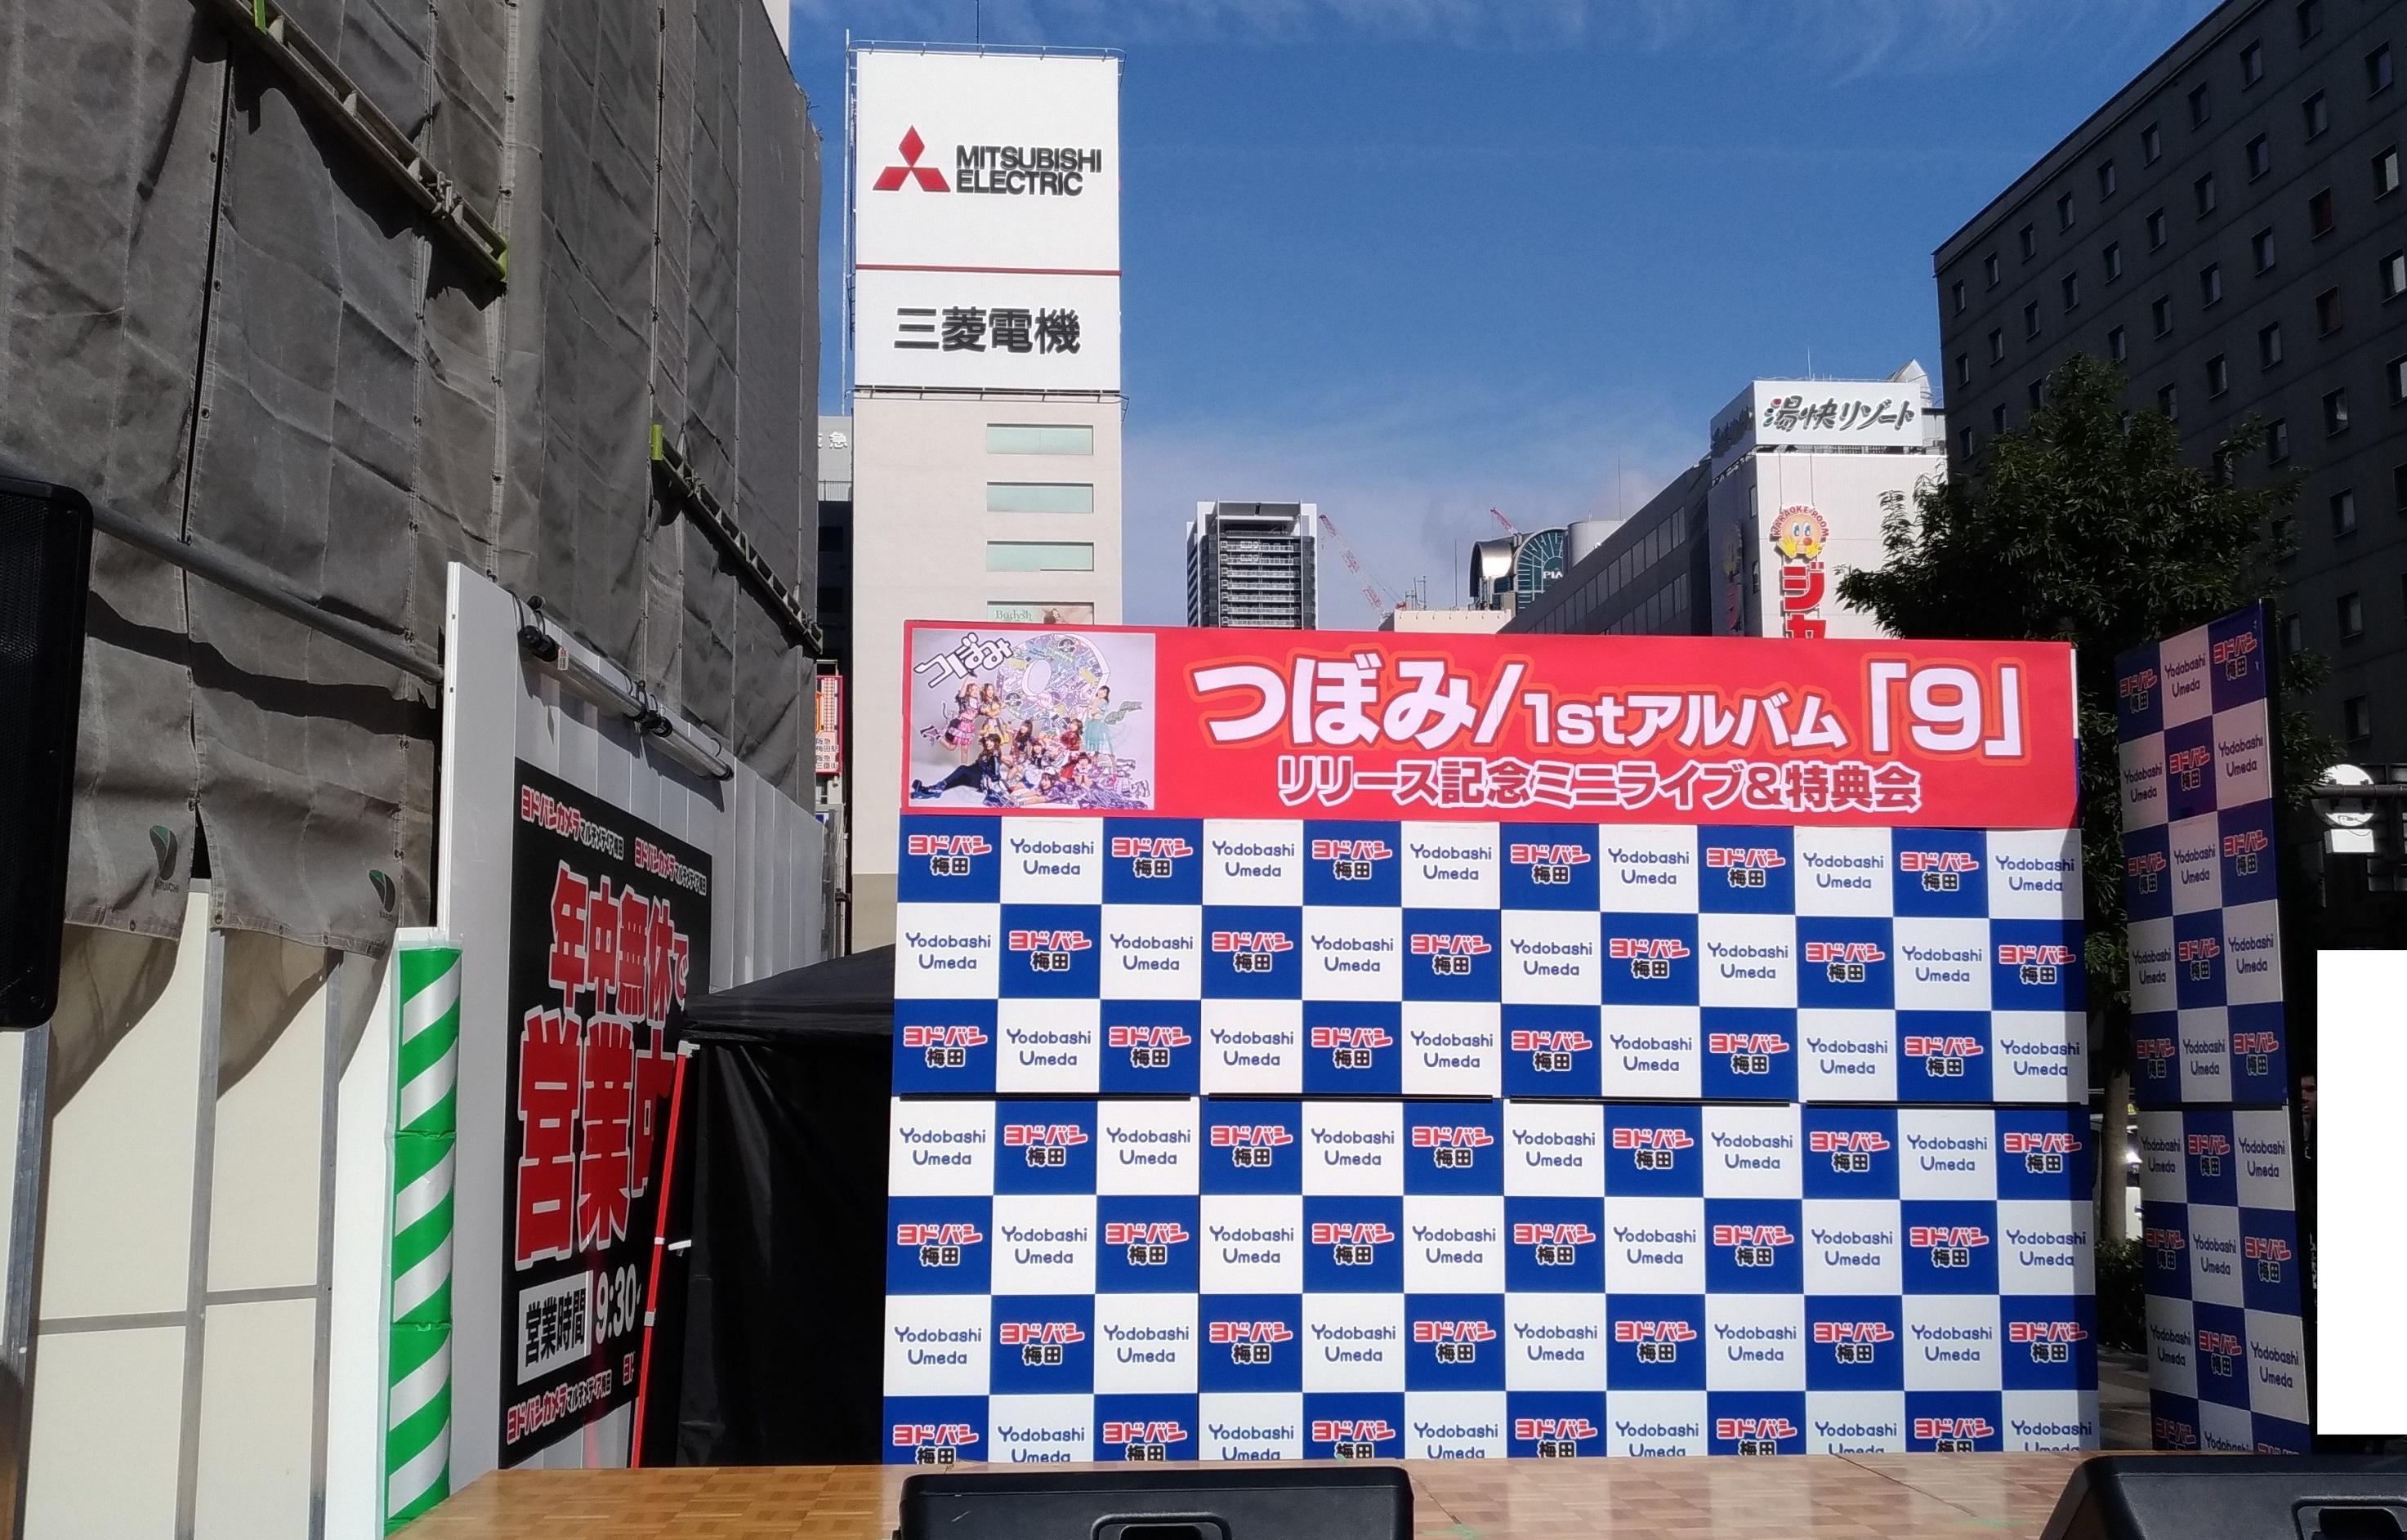 osaka_events_tsubomi_yodobashi.jpg